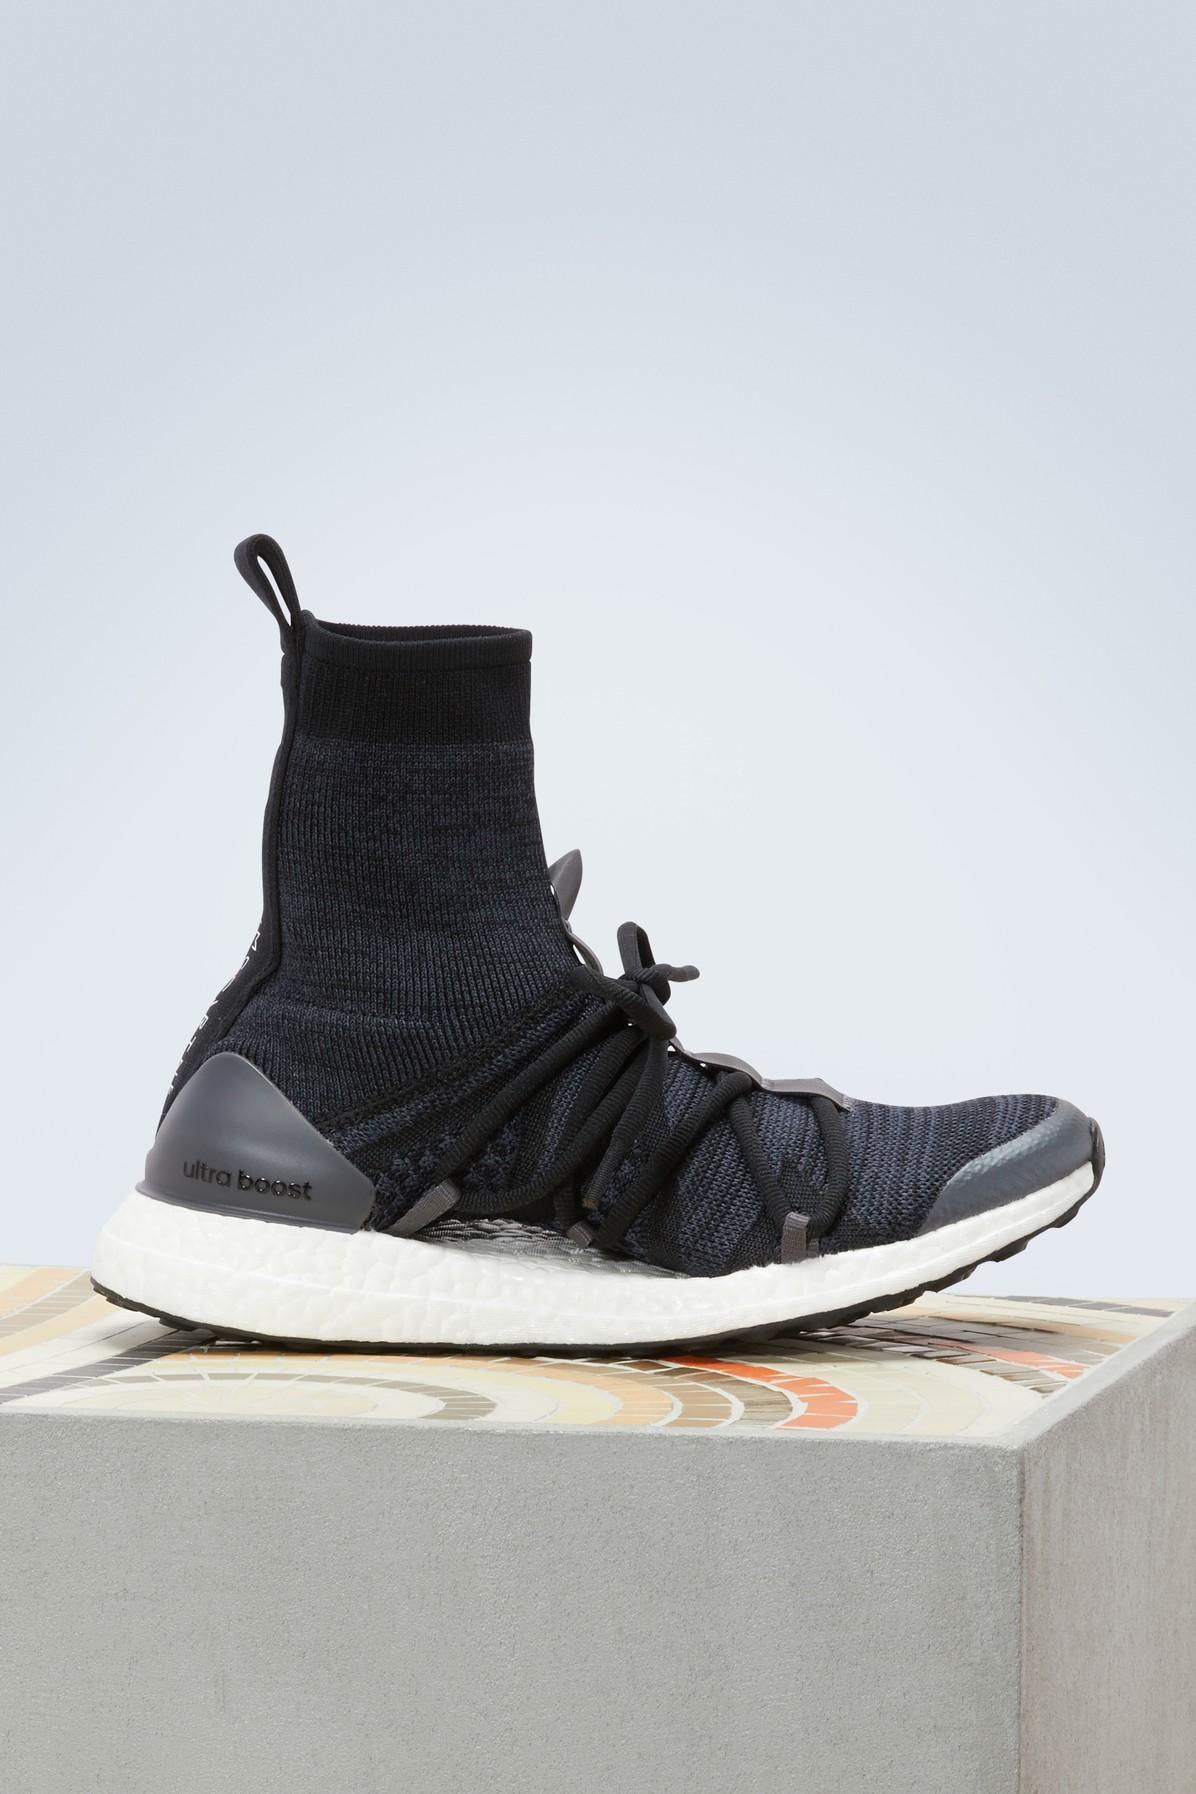 f075023e7eb76 ADIDAS BY STELLA MCCARTNEY. Ultraboost X Mid Sneakers in Core Black Night  Grey Night Steel-Smc